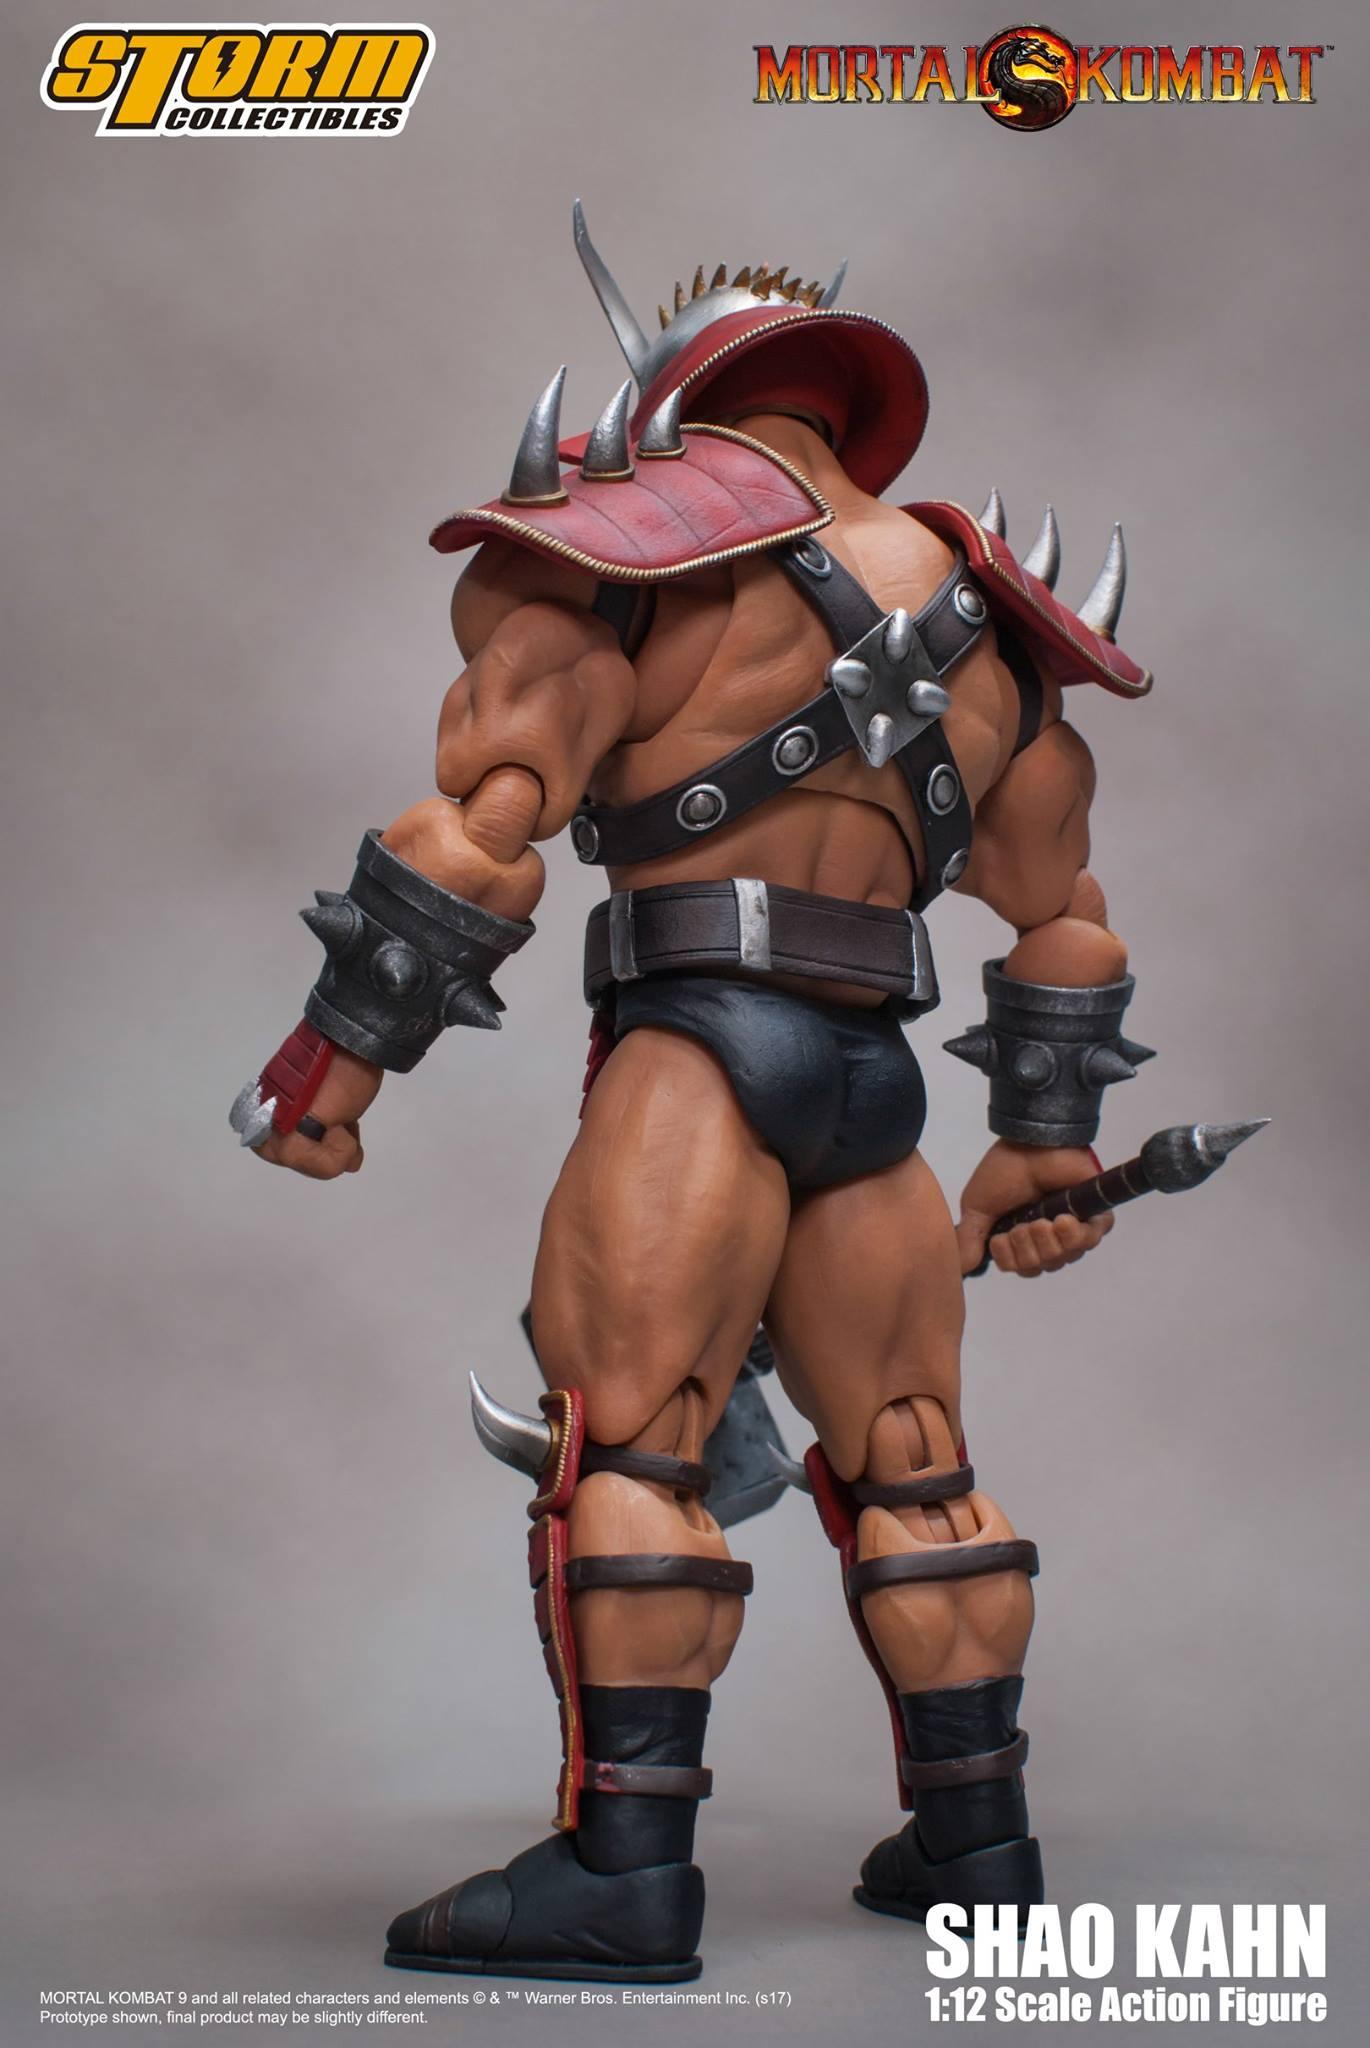 Storm-Mortal-Kombat-Shao-Kahn-009